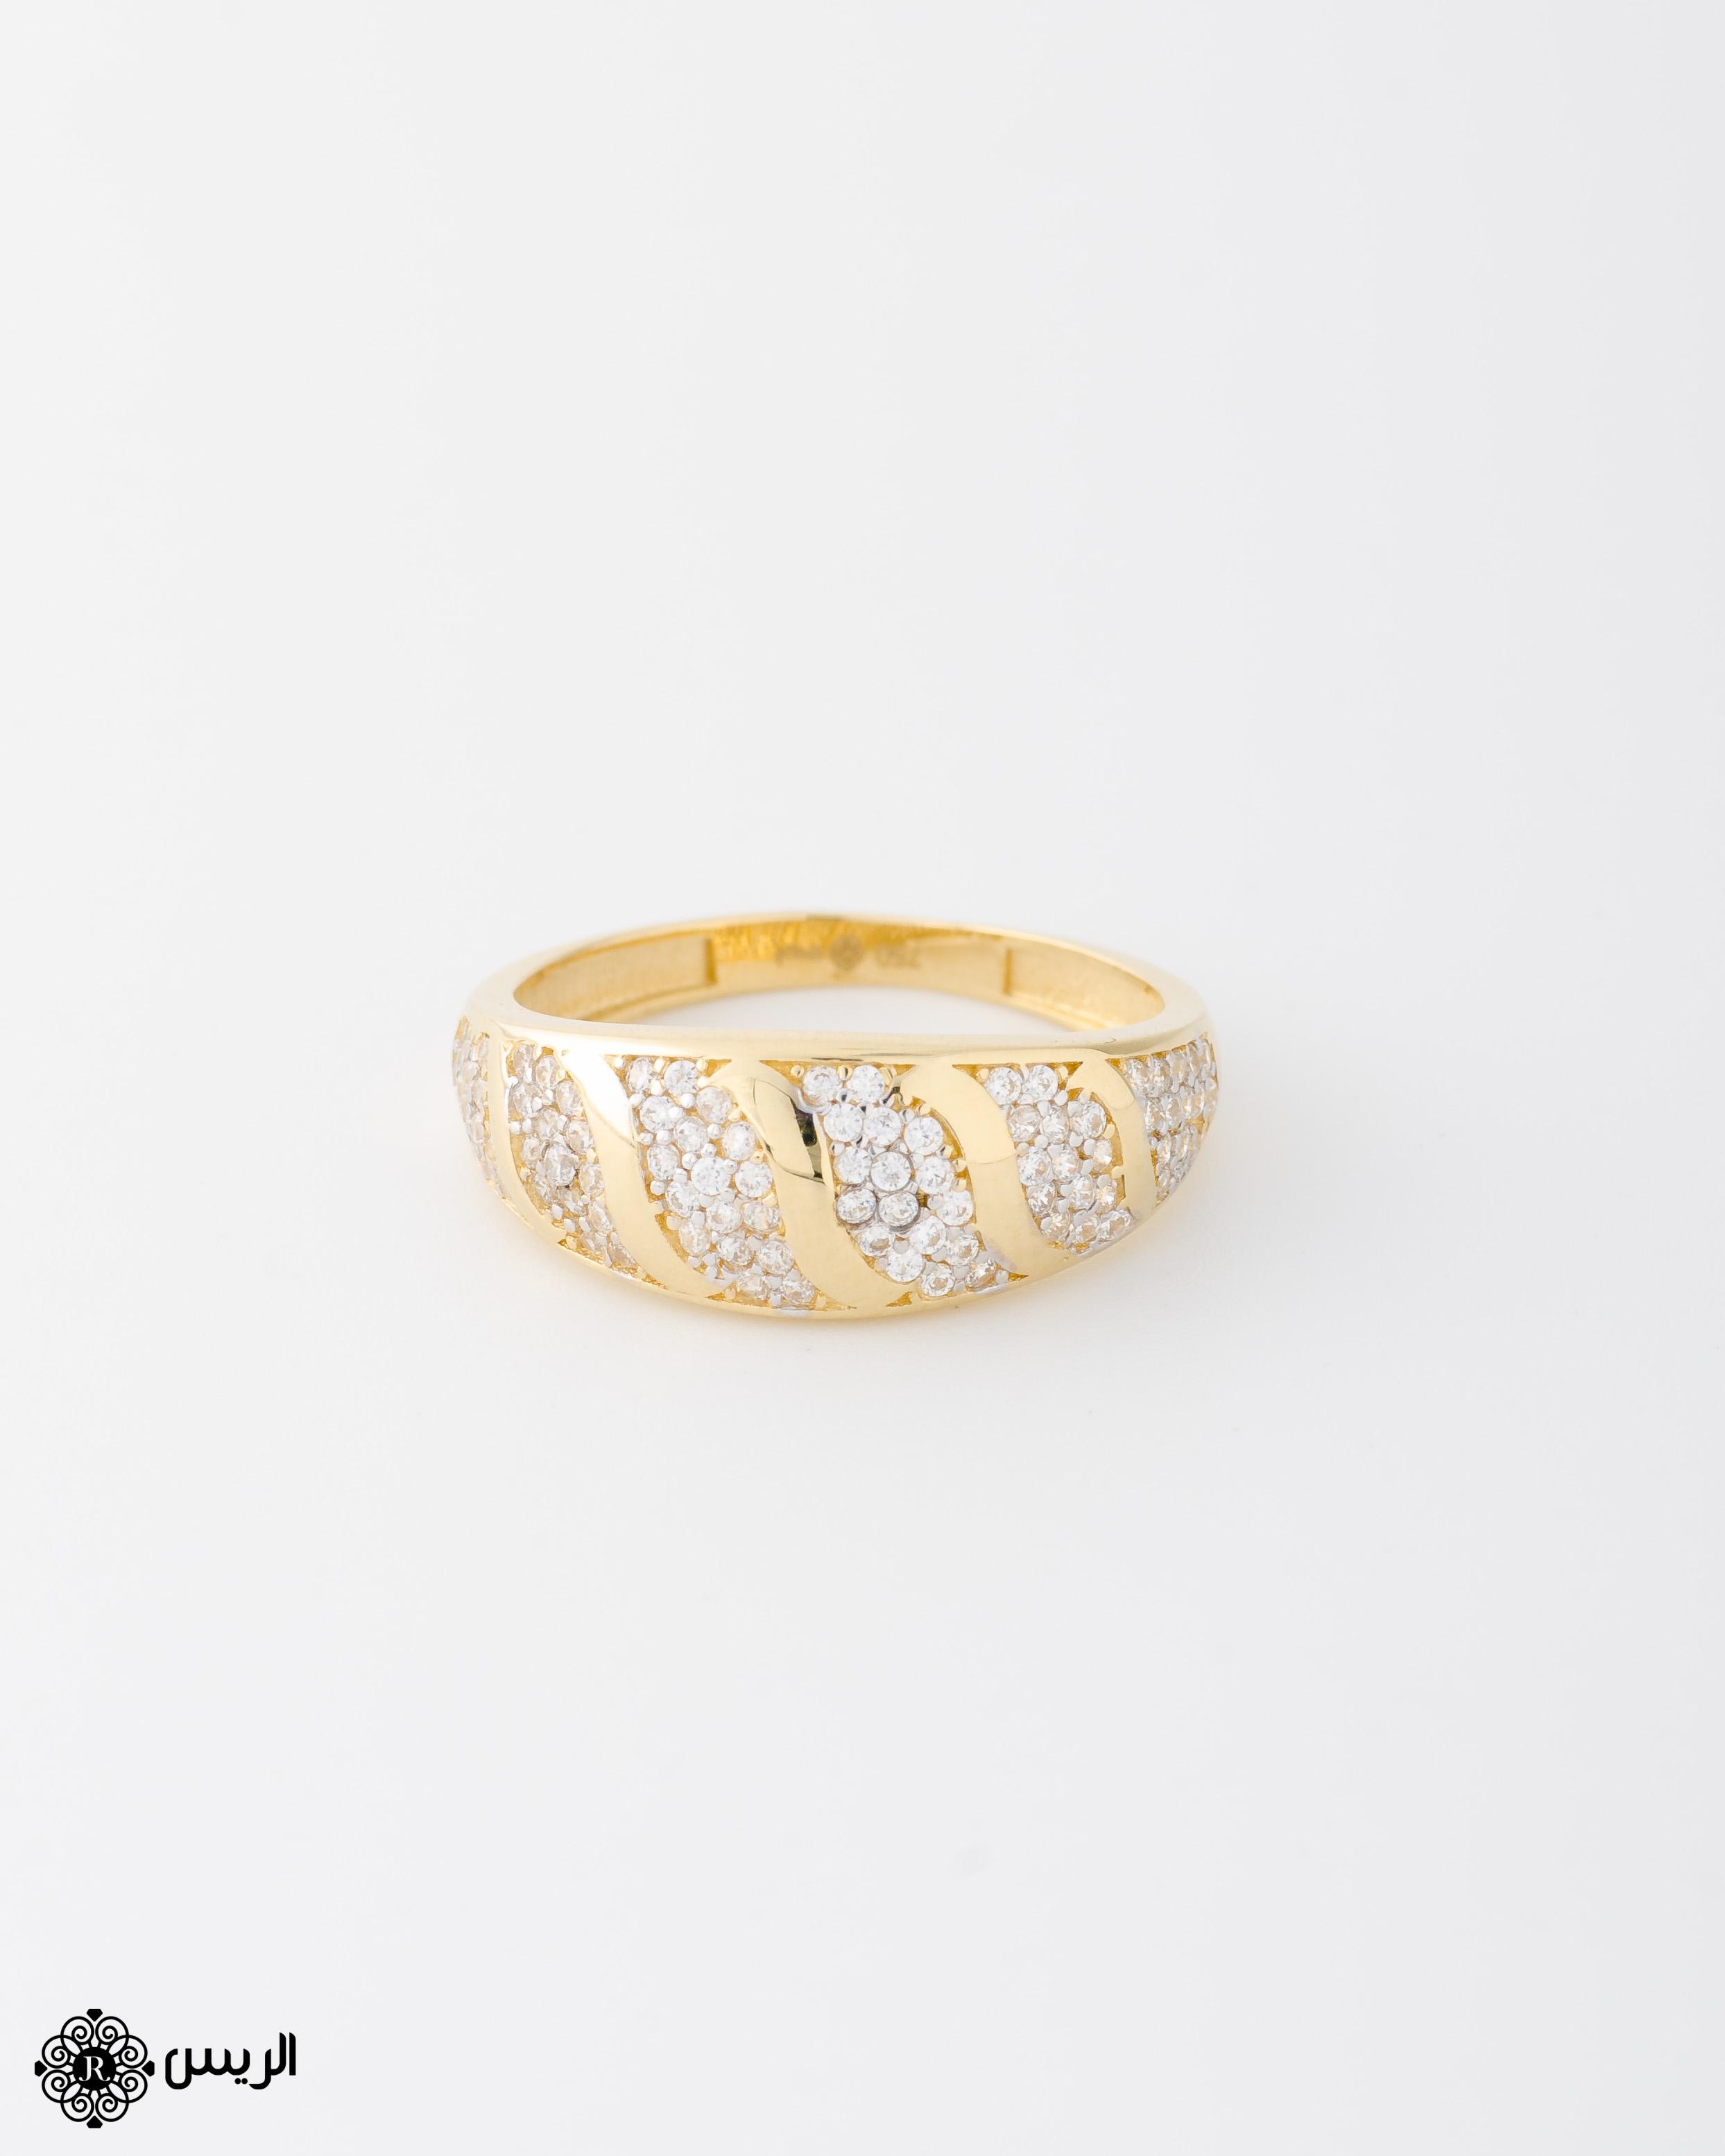 Raies jewelry Italian Design Ring خاتم تصميم إيطالي الريس للمجوهرات